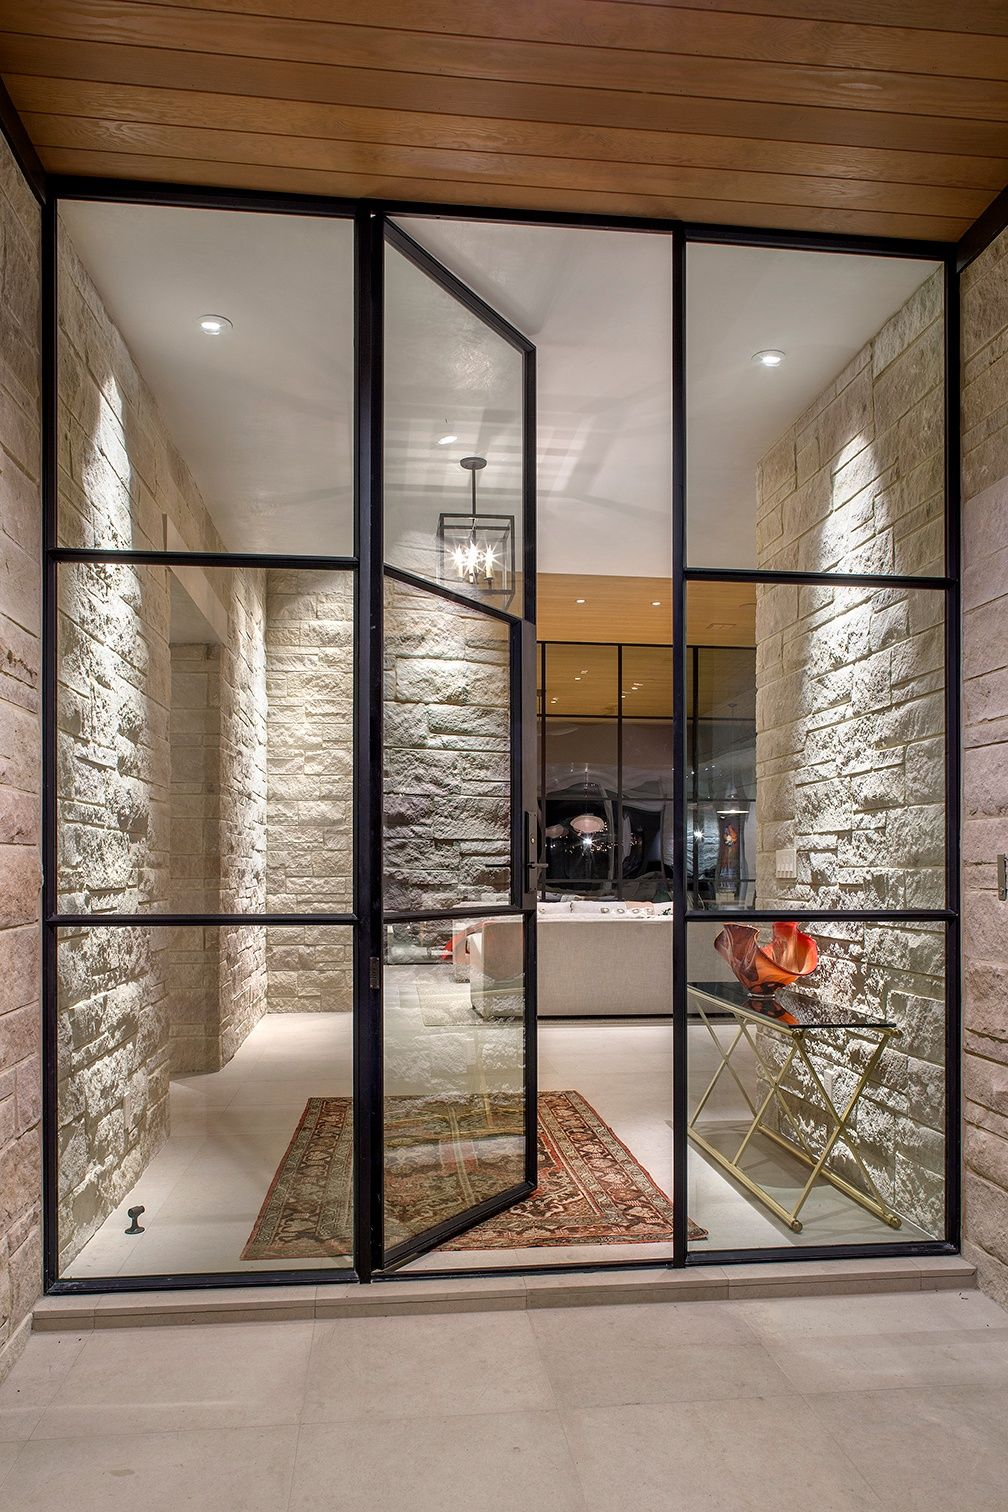 Steel Windows And Doors Gallery Possible Interior Solution